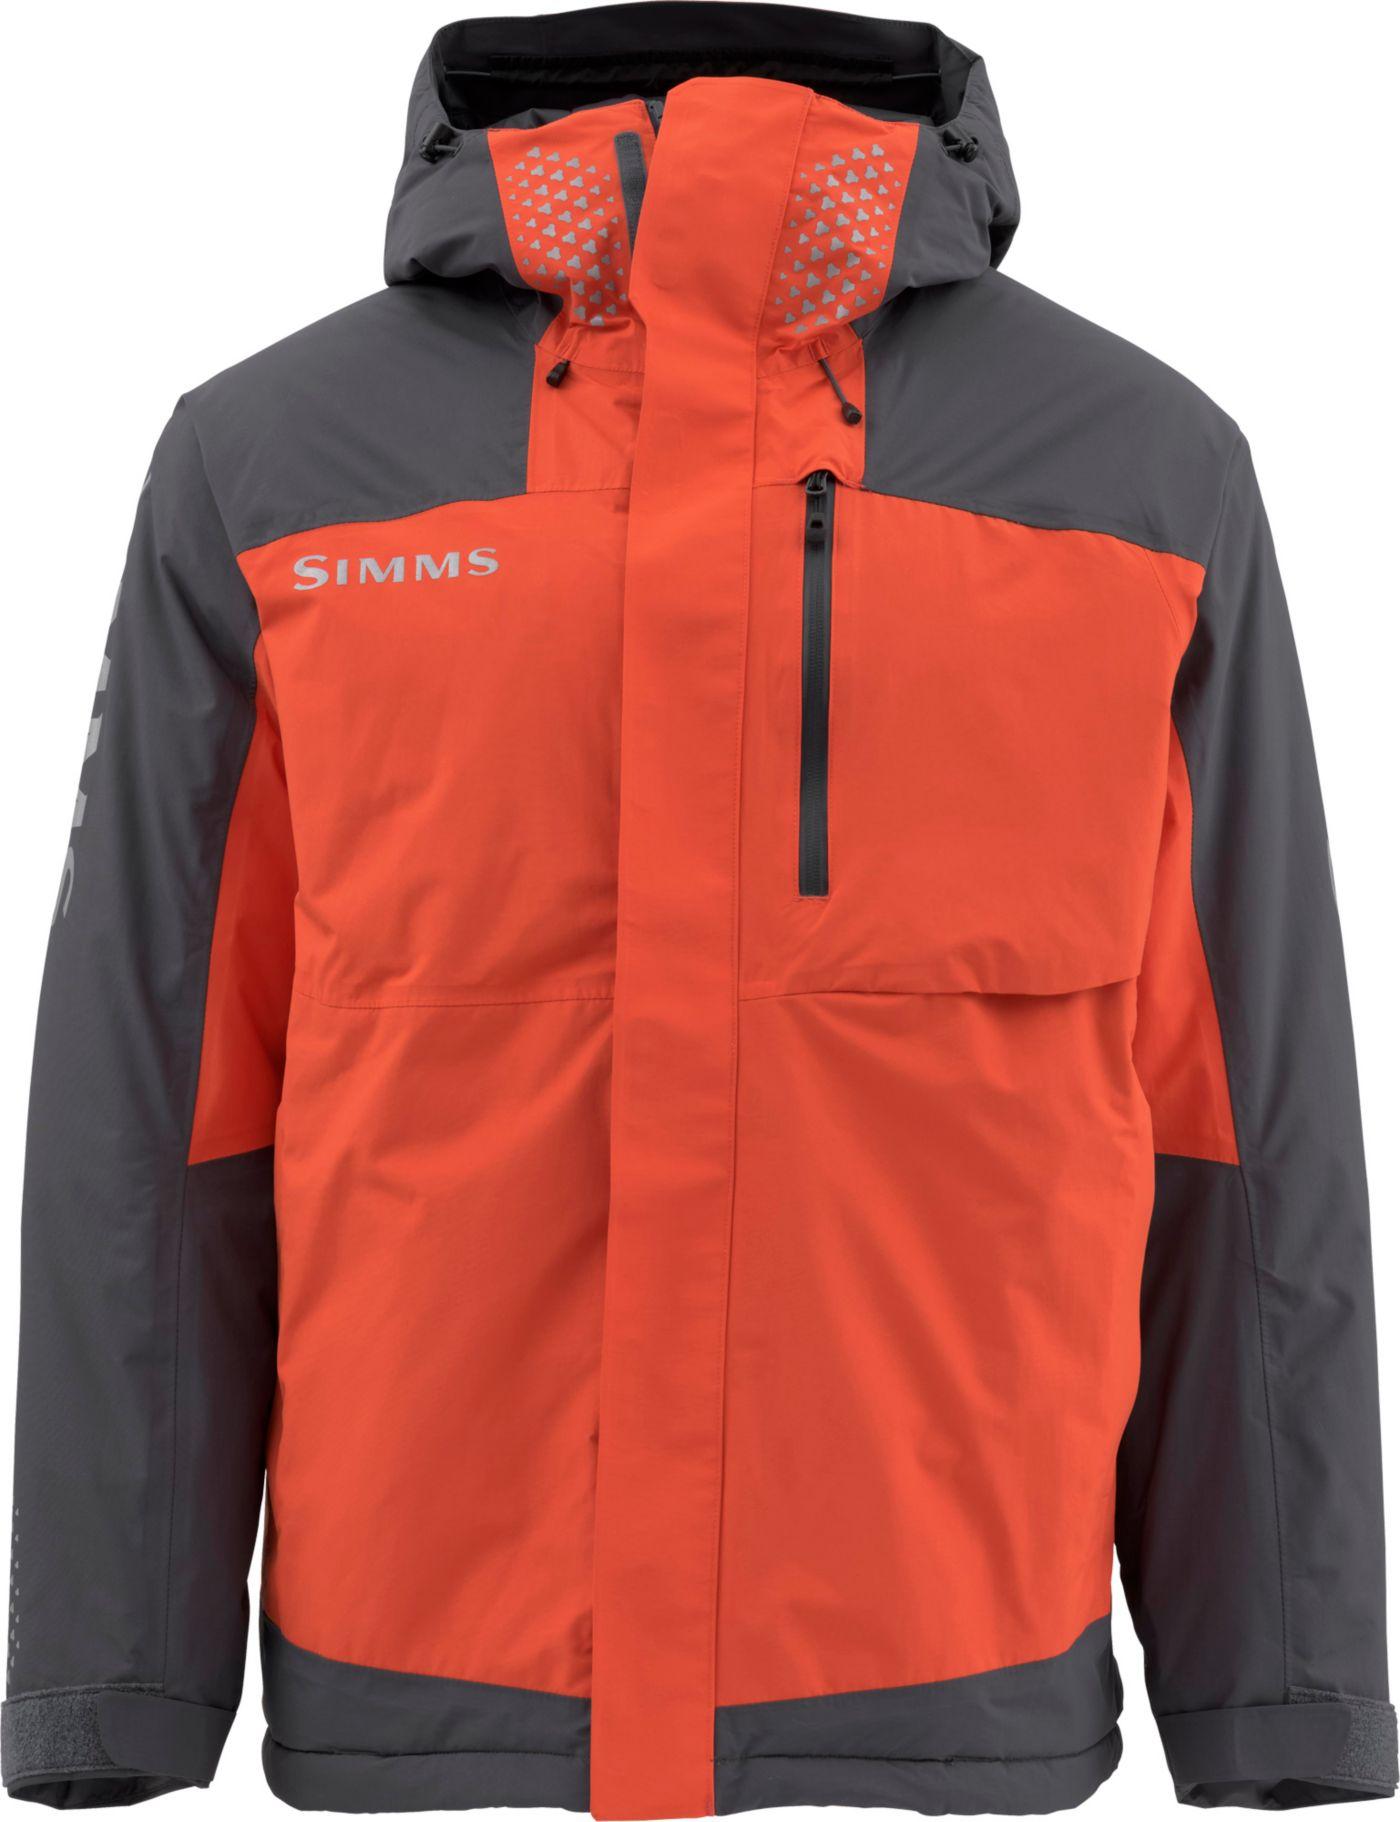 Simms Men's Challenger Insulated Jacket (Regular and Big & Tall)